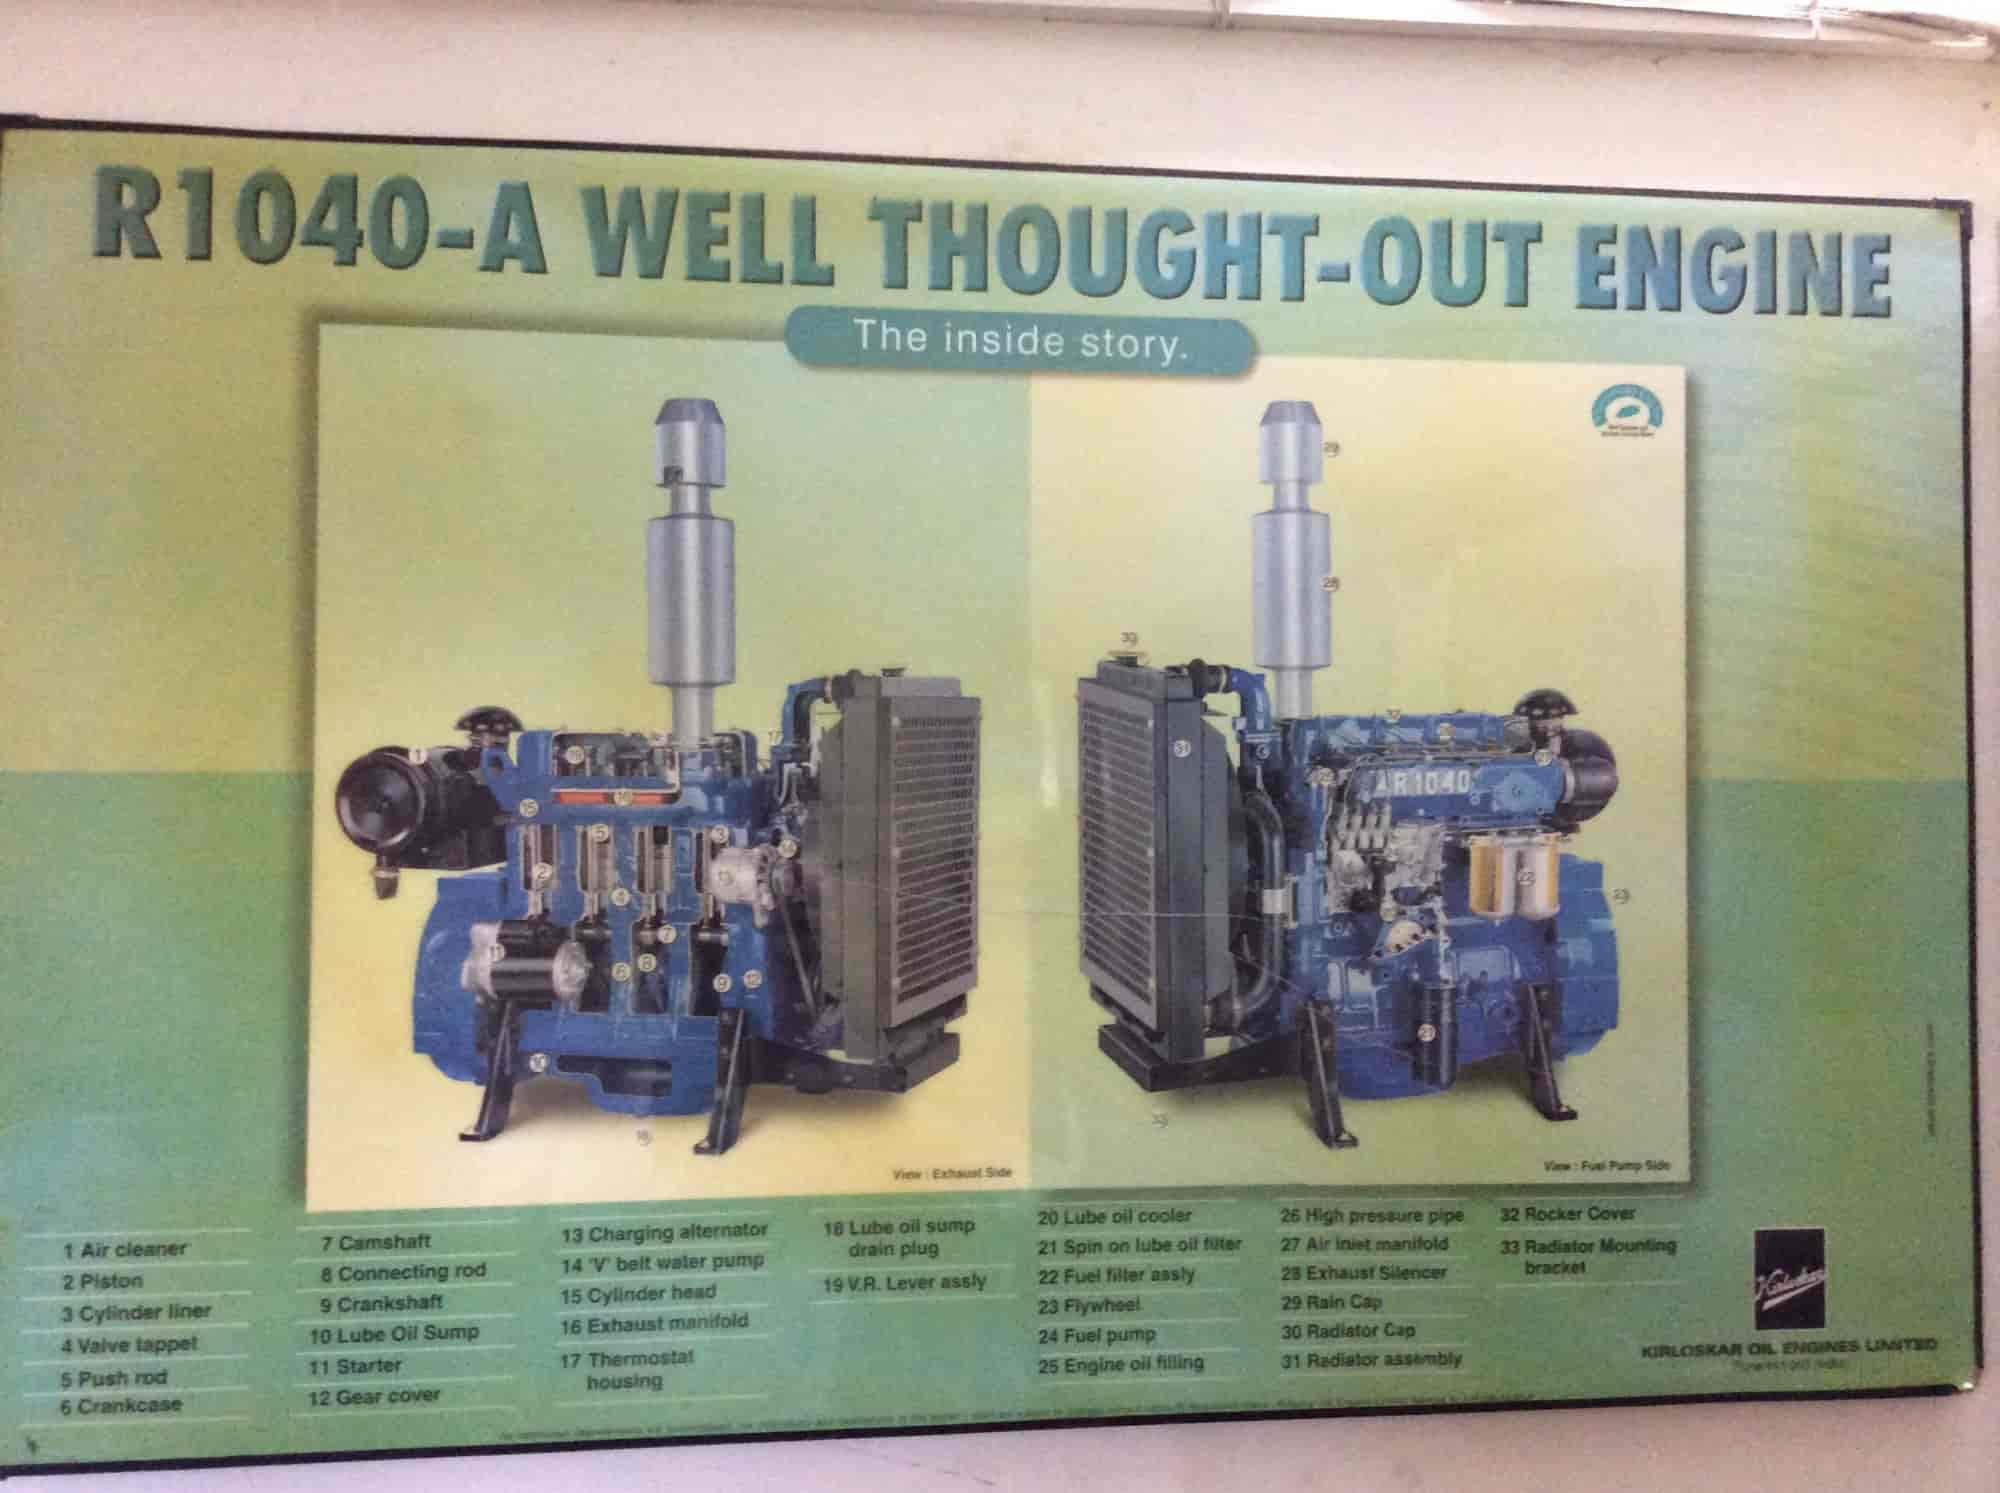 Electro Diesel Engine Oil Dealers In Thanjavur Justdial 6 7 Powerstroke Fuel Filter